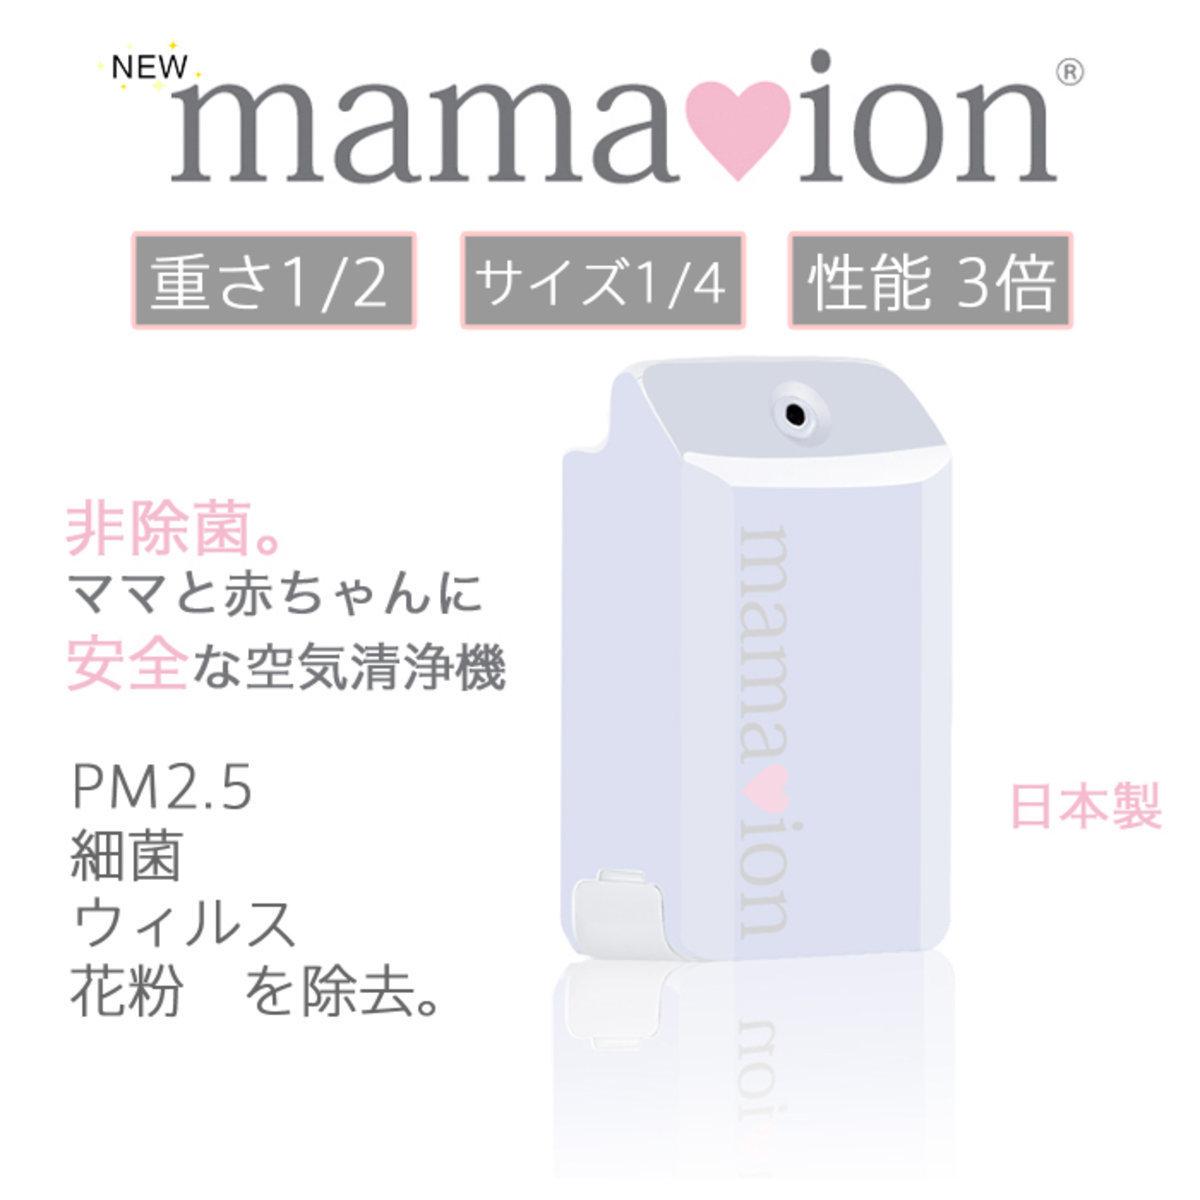 (White) Made in Japan Mamaion Air Purifier